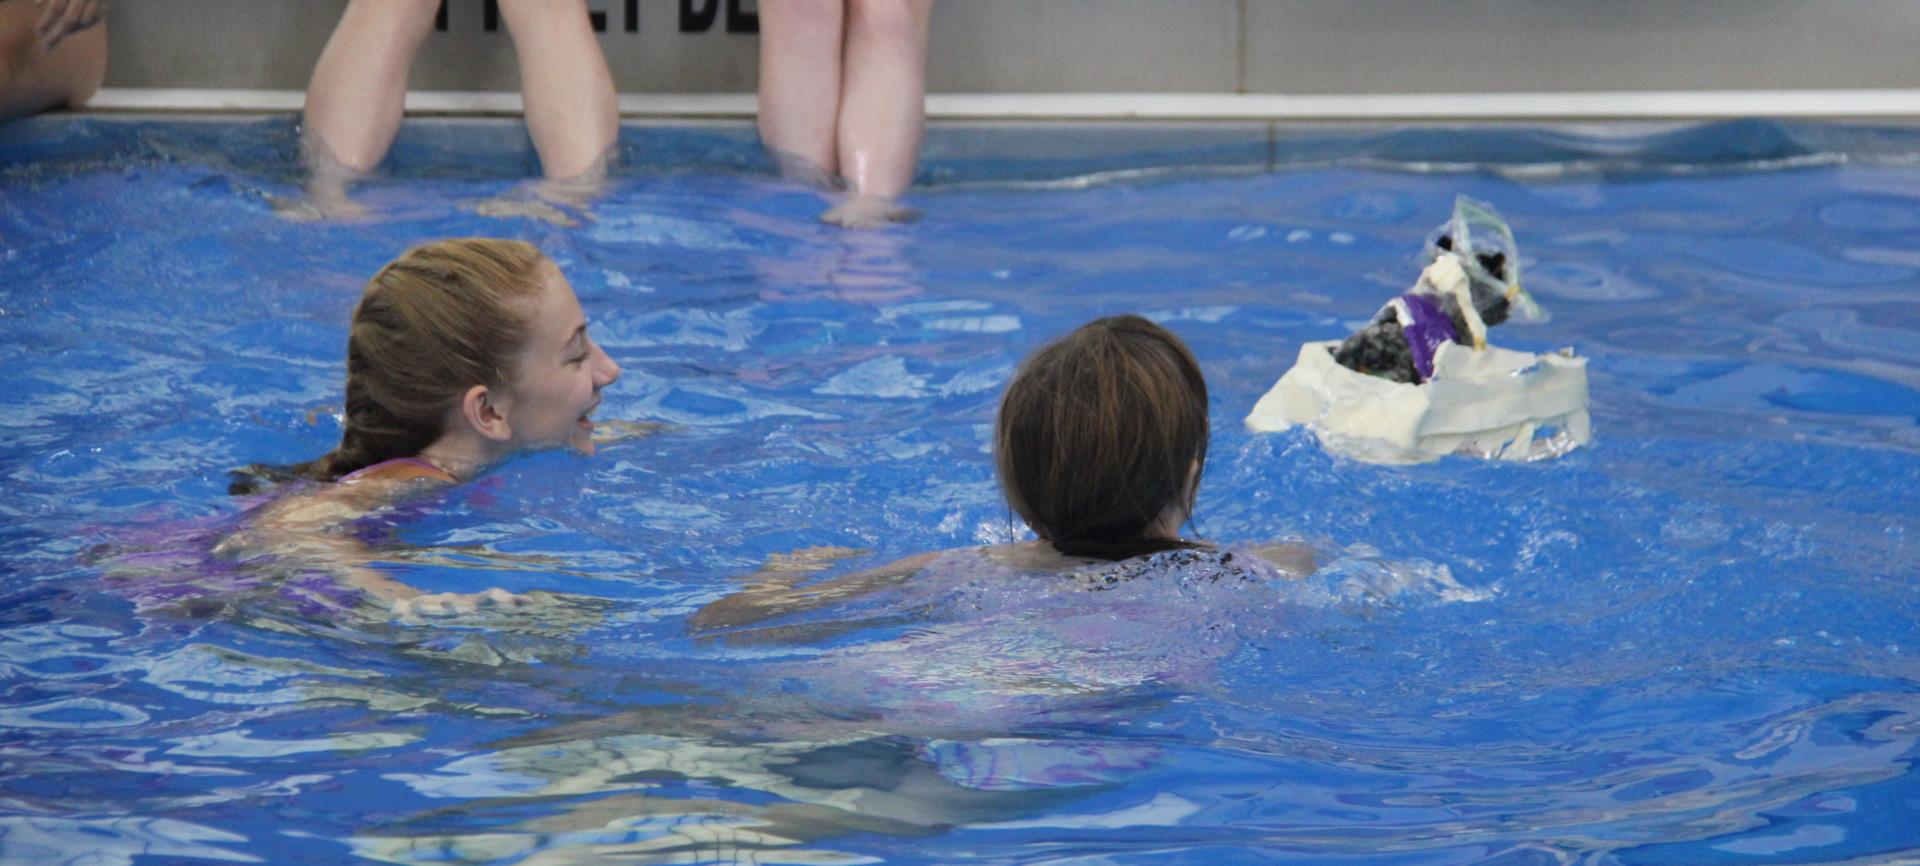 students using raft to get stuffed animal across pool